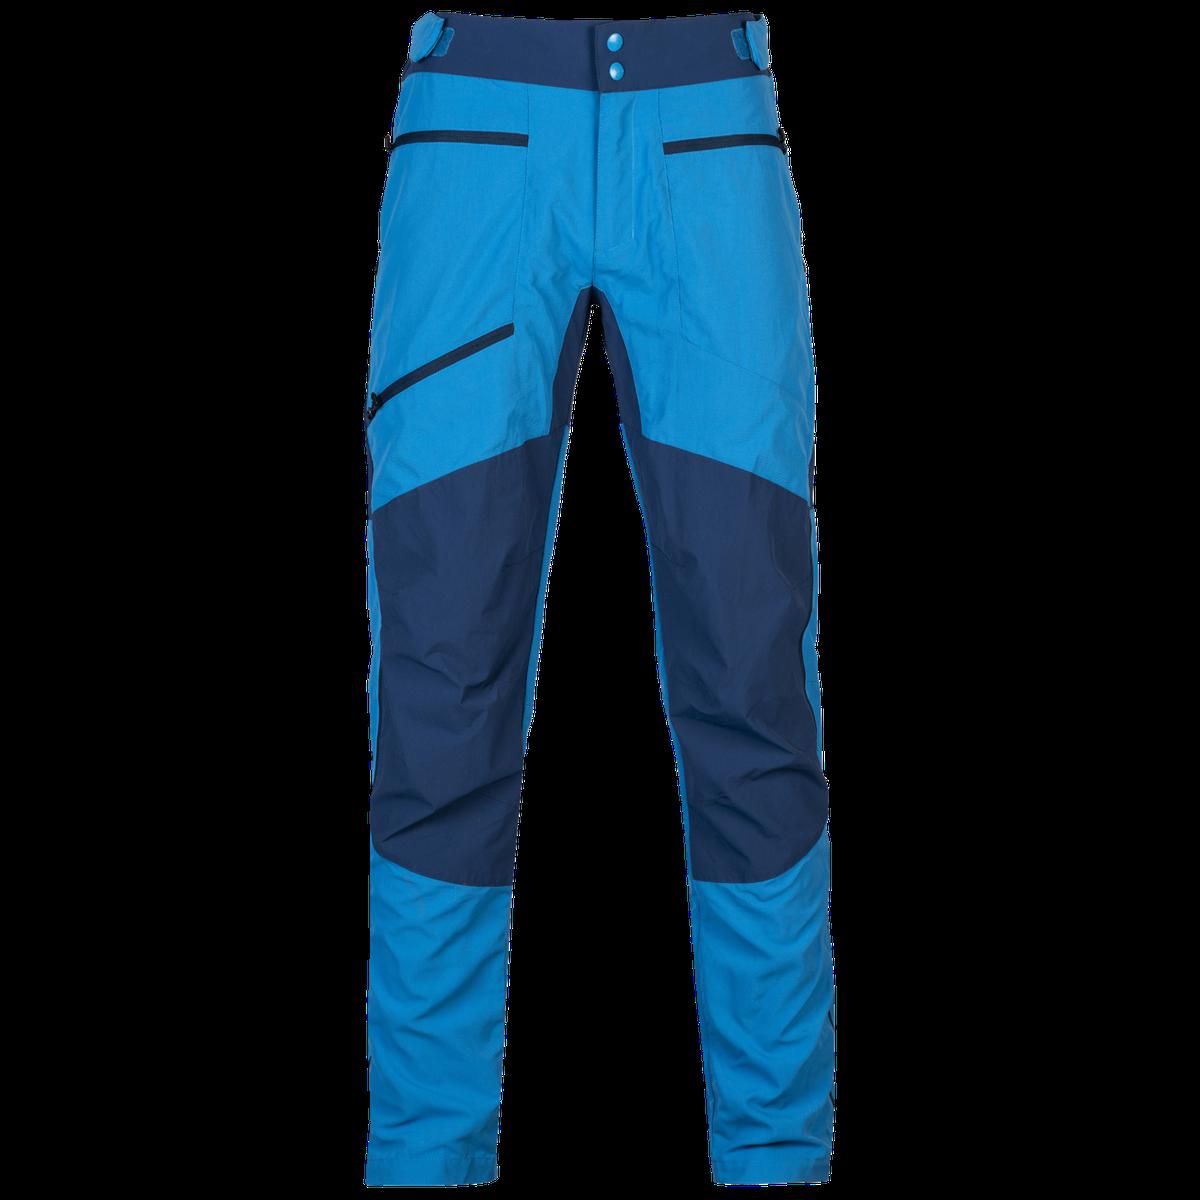 3c6e909f Neomondo Cavan Softshell Mns Indigo Blue - Blå - Softshellbukser   XXL